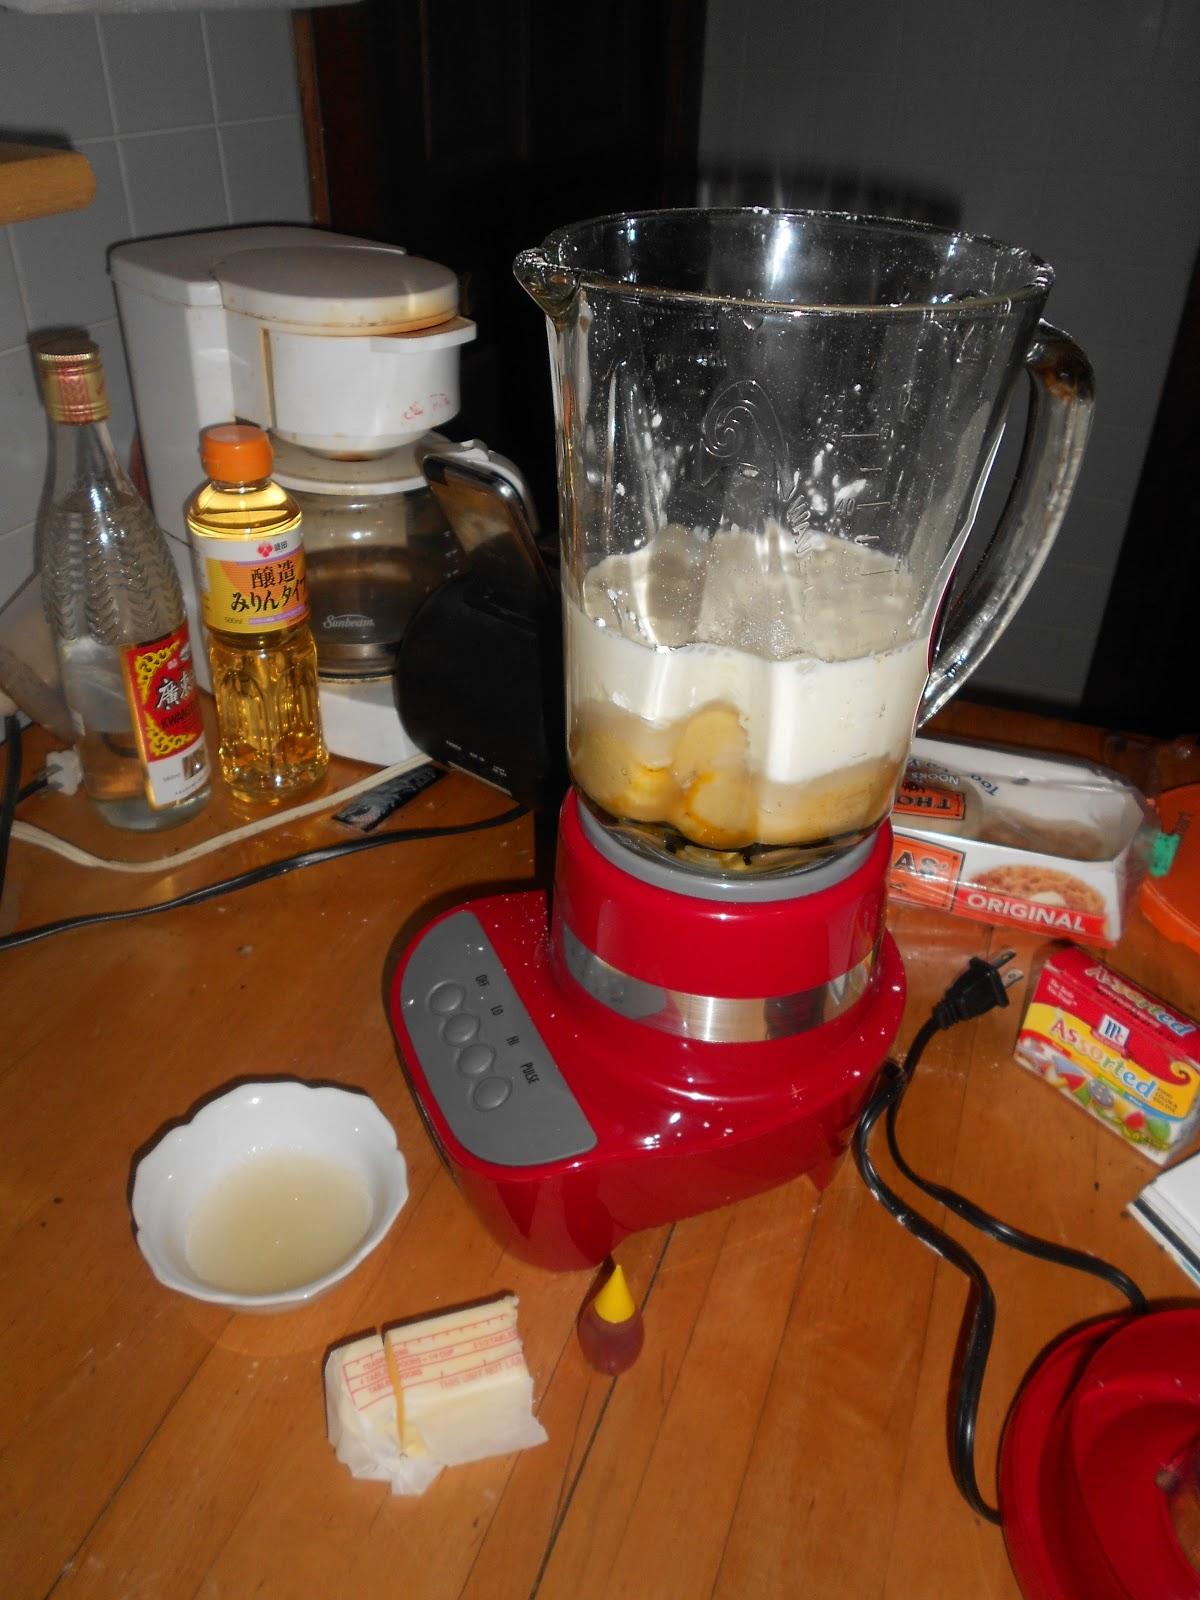 Accidental Cream Pie Cheap the accidental brainwashed foodie: banana cream pie (lucky peach 2)